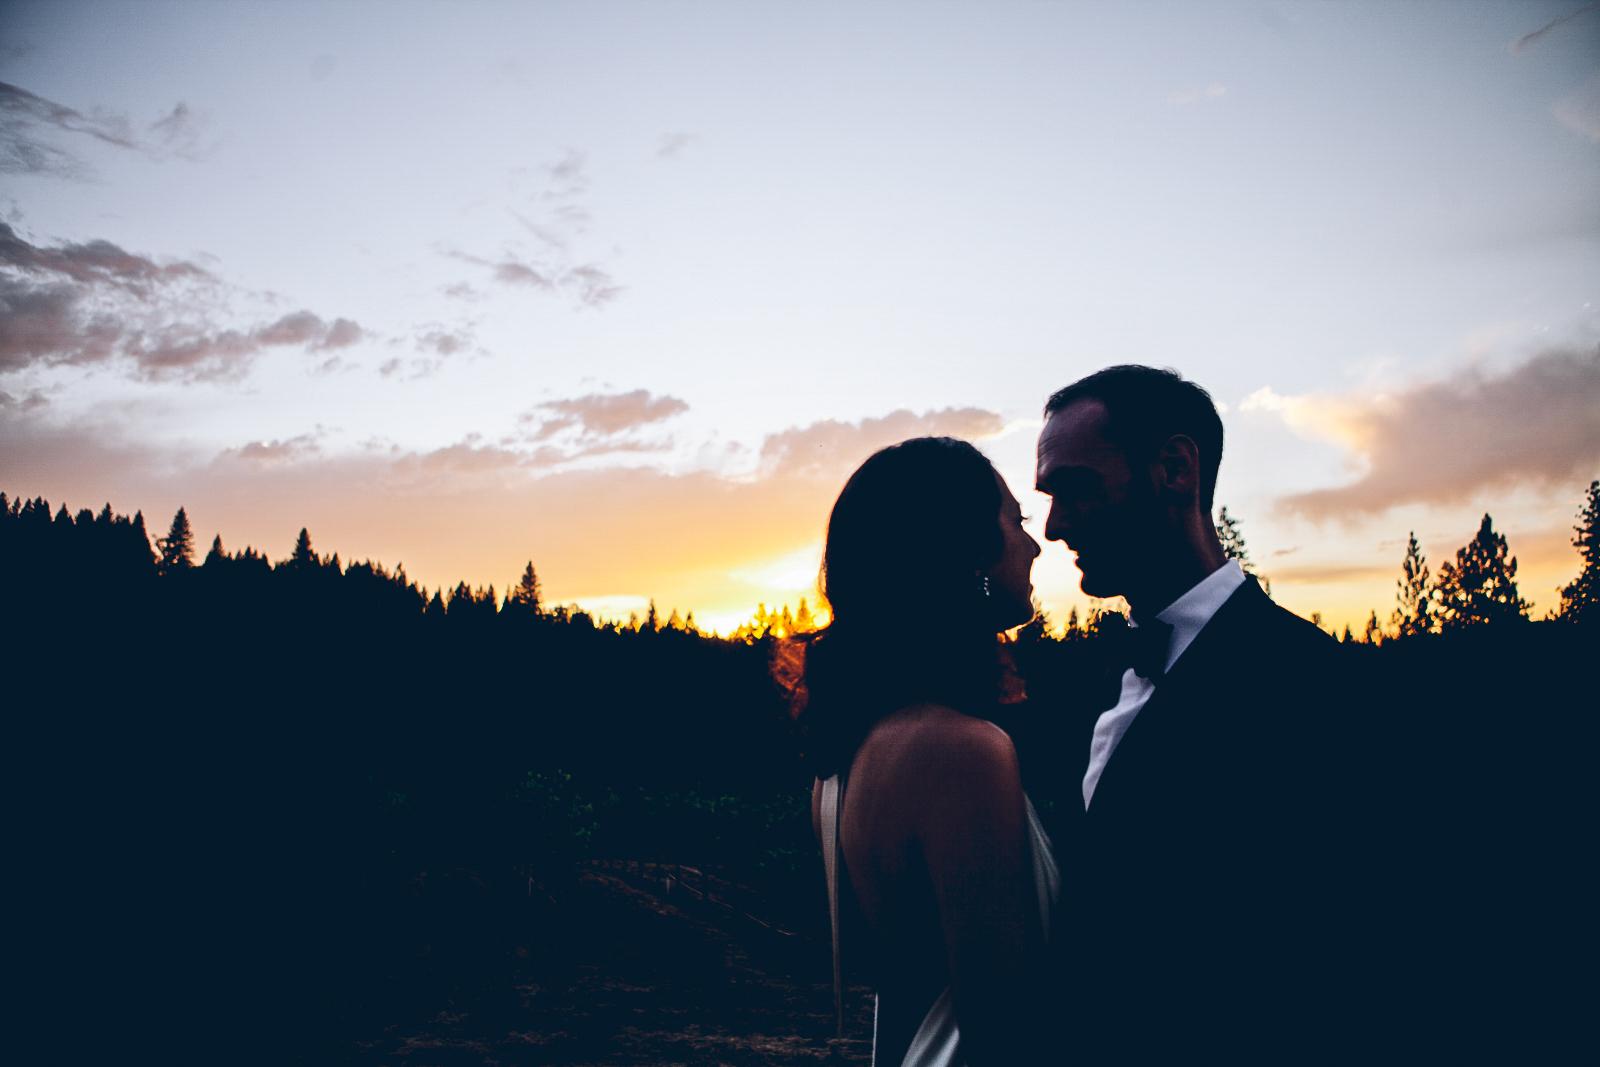 miraflores_winery_wedding_photography_ian_melissa_ebony_siovhan_bokeh_photography_70.jpg